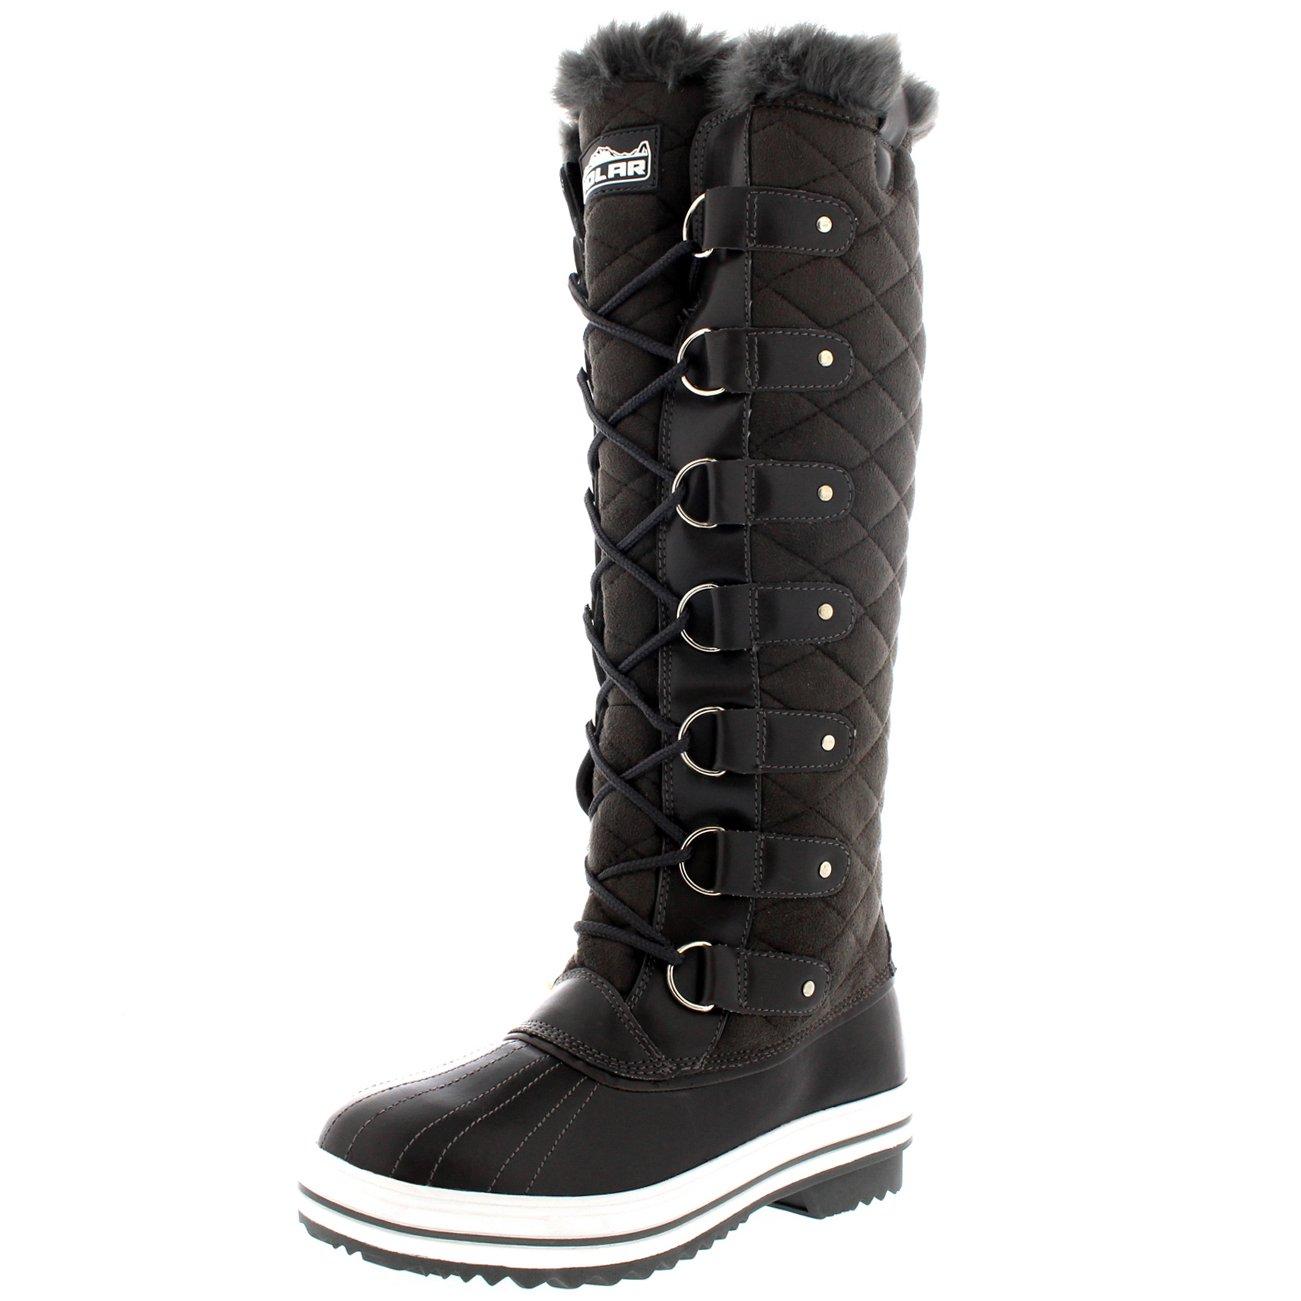 Women Shoe Winter Warm Tall Boots Rain Knee High Lace Up ...